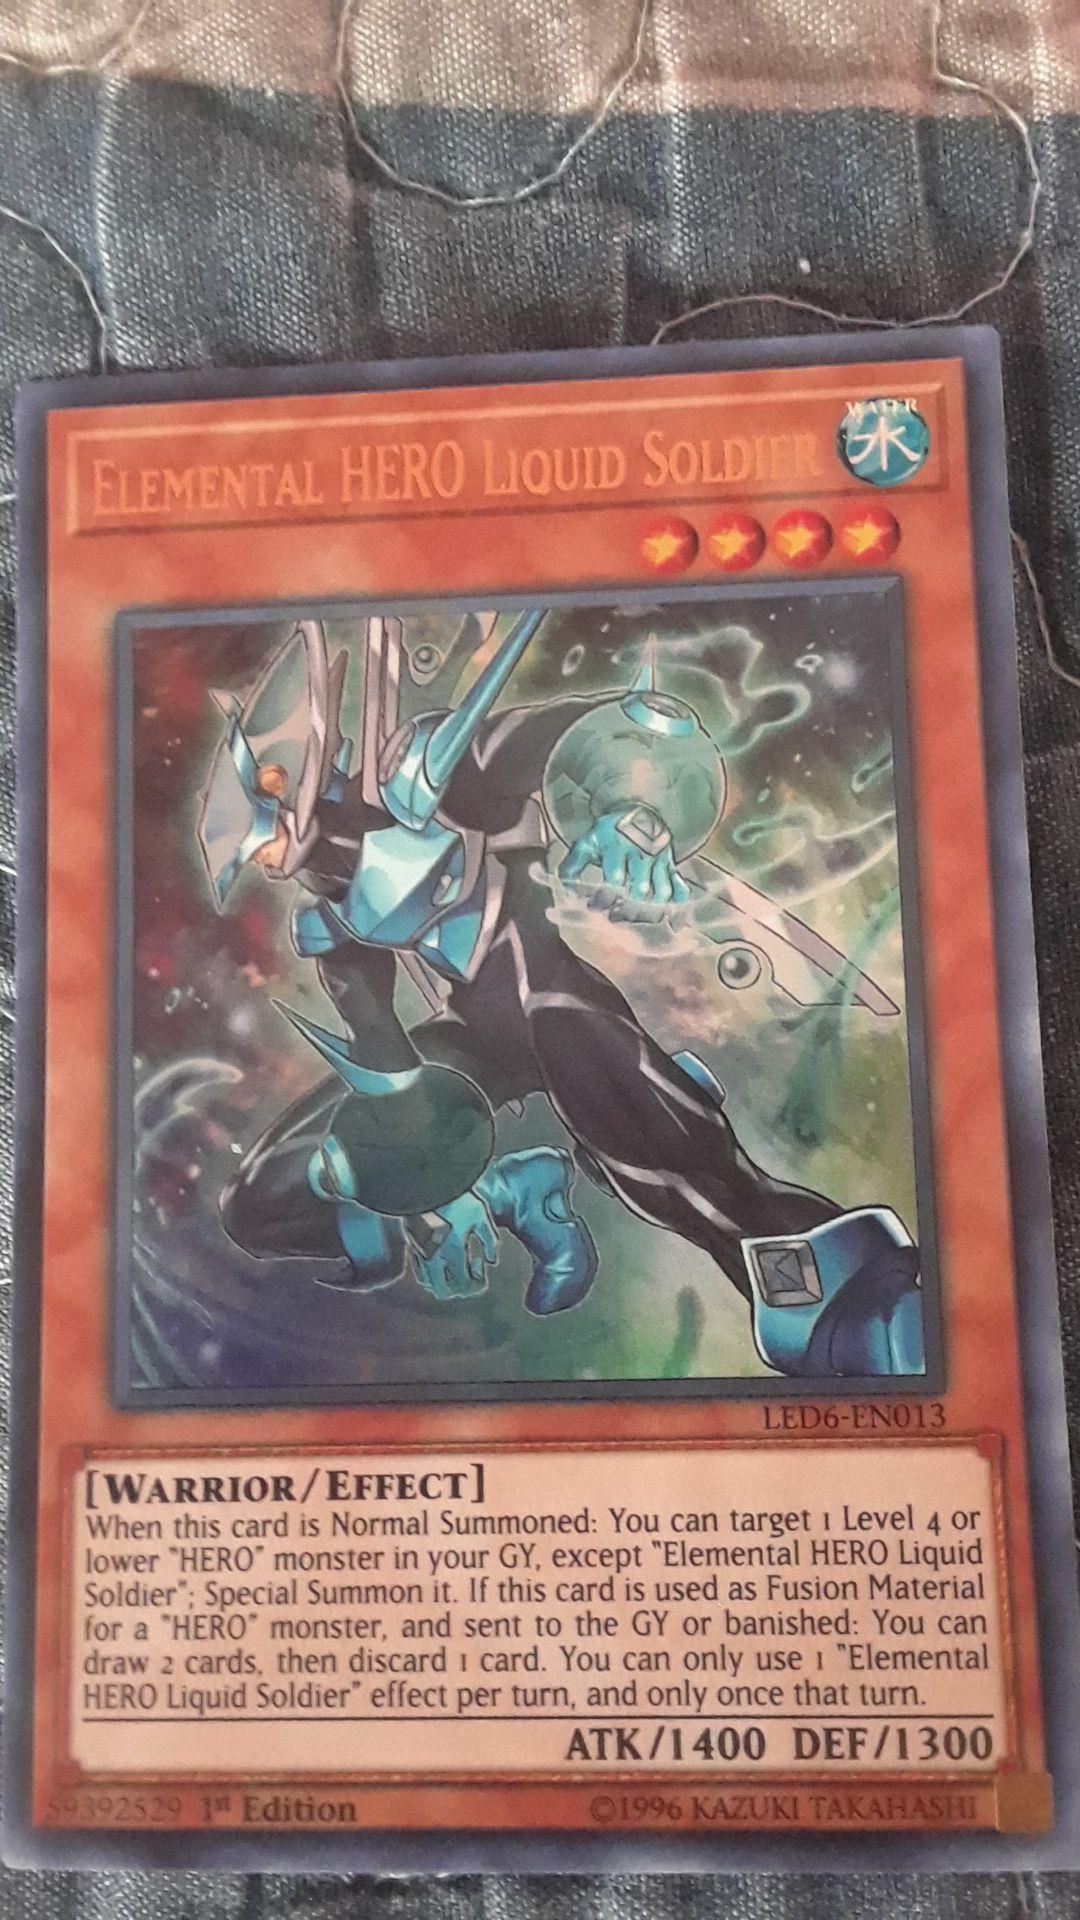 Elemental Hero Liquid Soldier